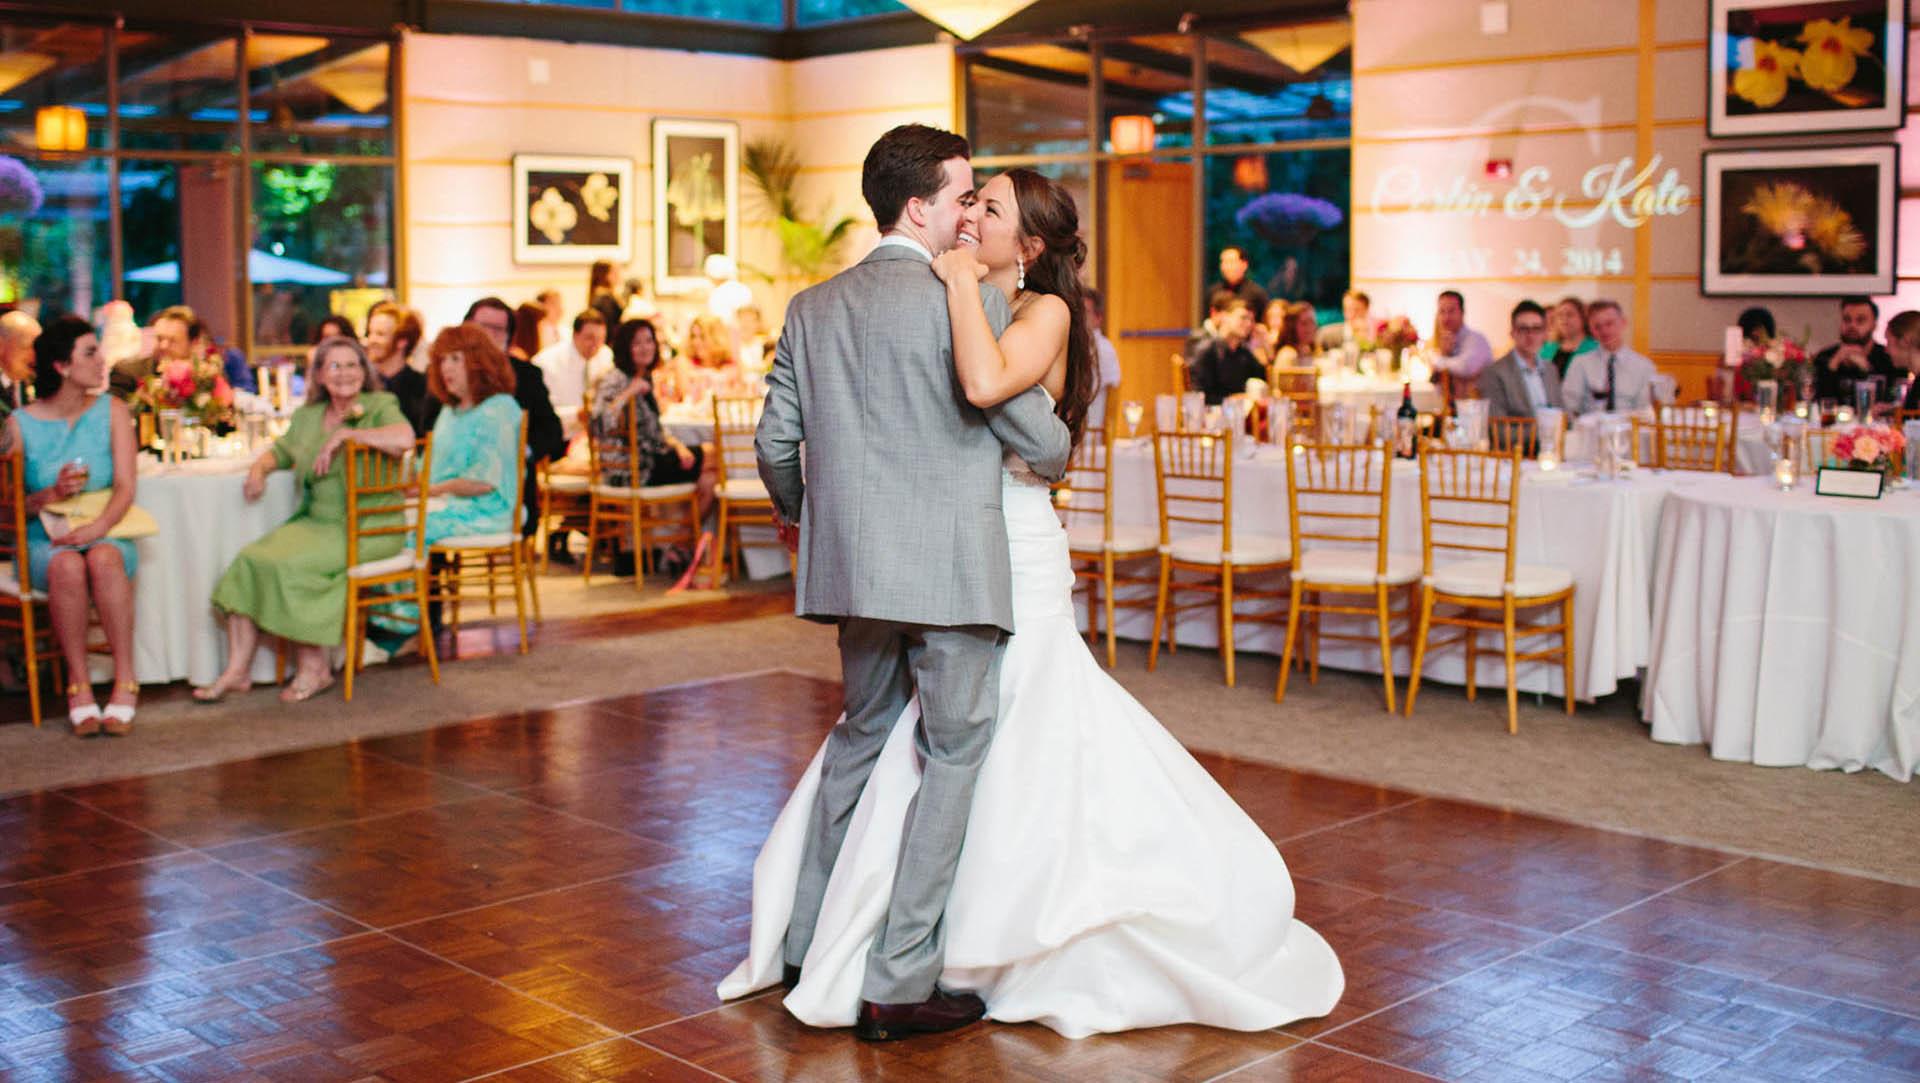 Dallas Wedding DJ For Weddings Around DFW